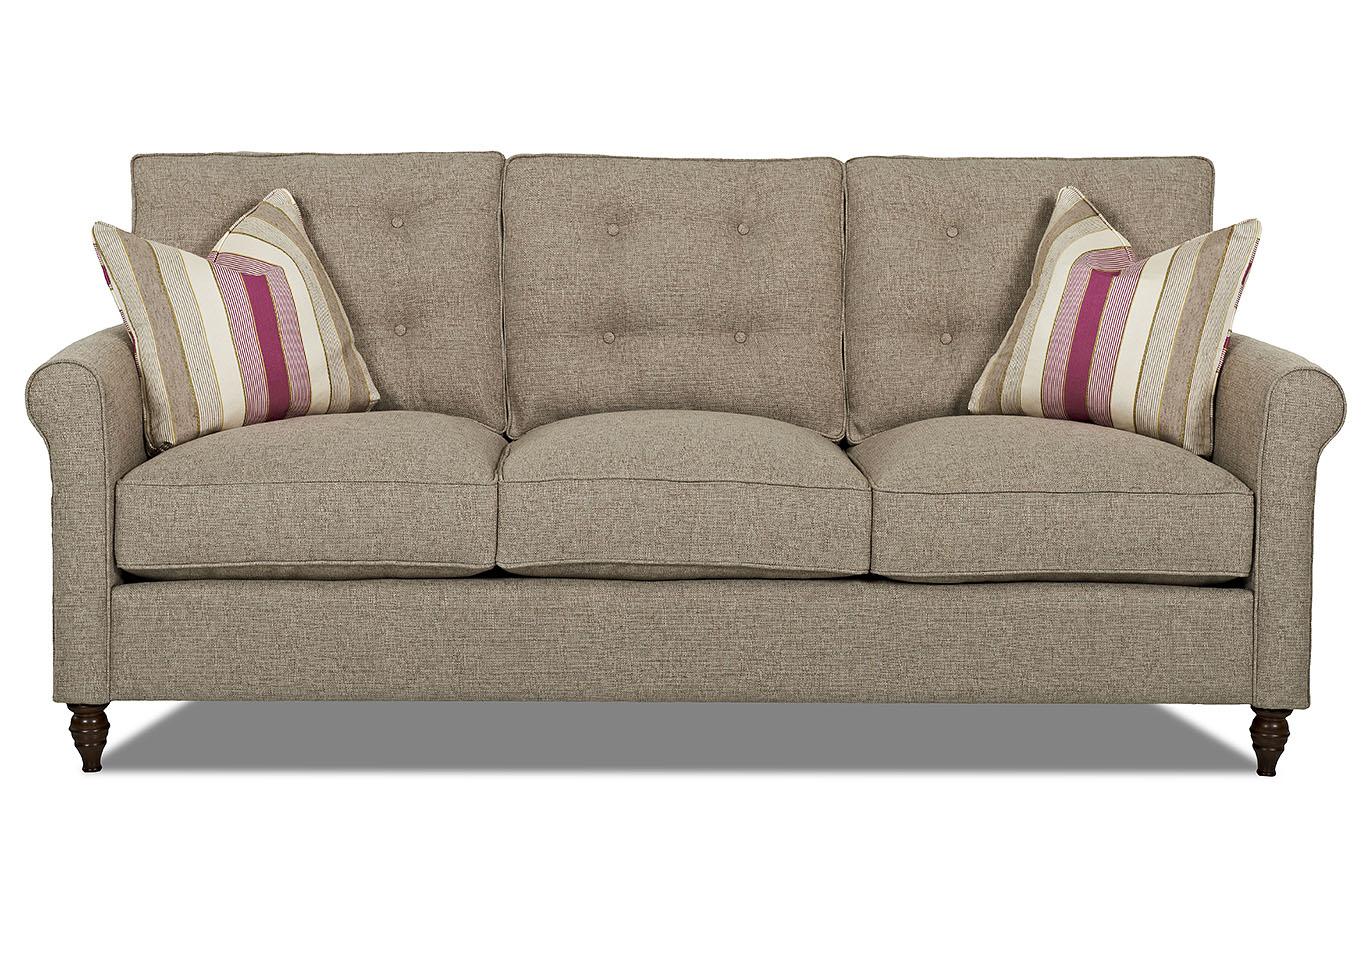 Holland Brown Stationary Fabric Sofa,Klaussner Home Furnishings